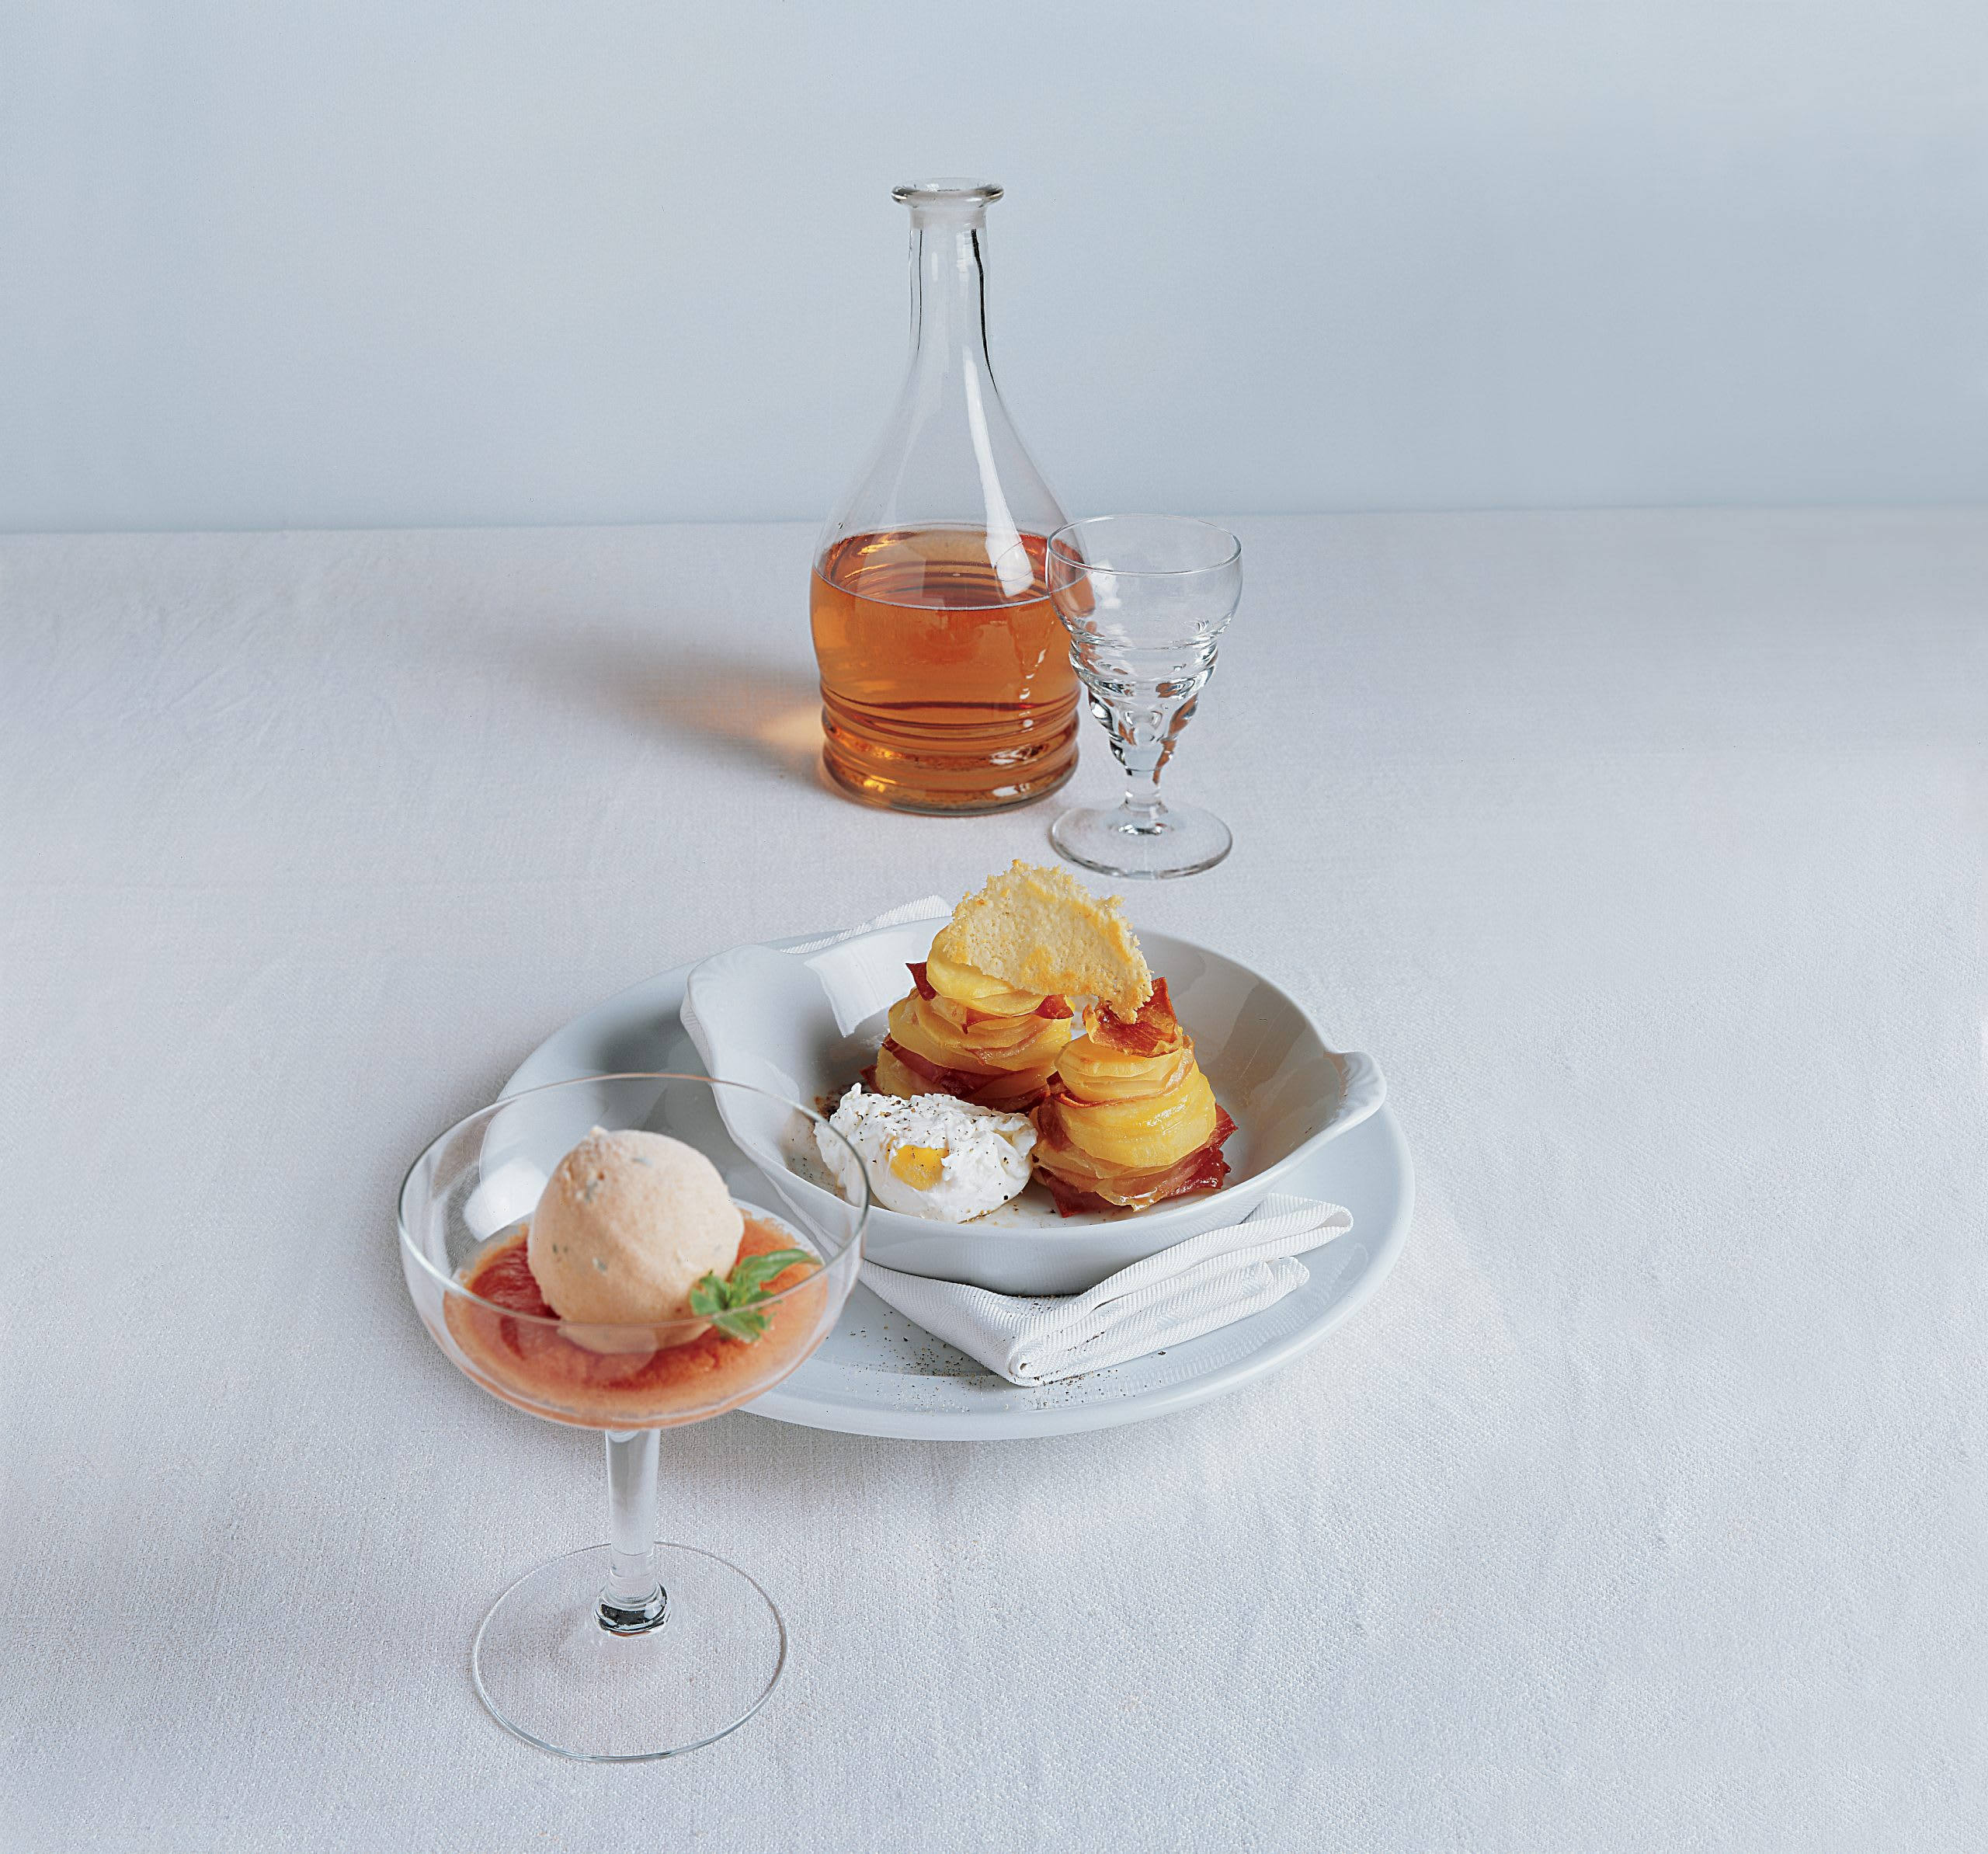 Salzige Tomatenglace mit Coulis